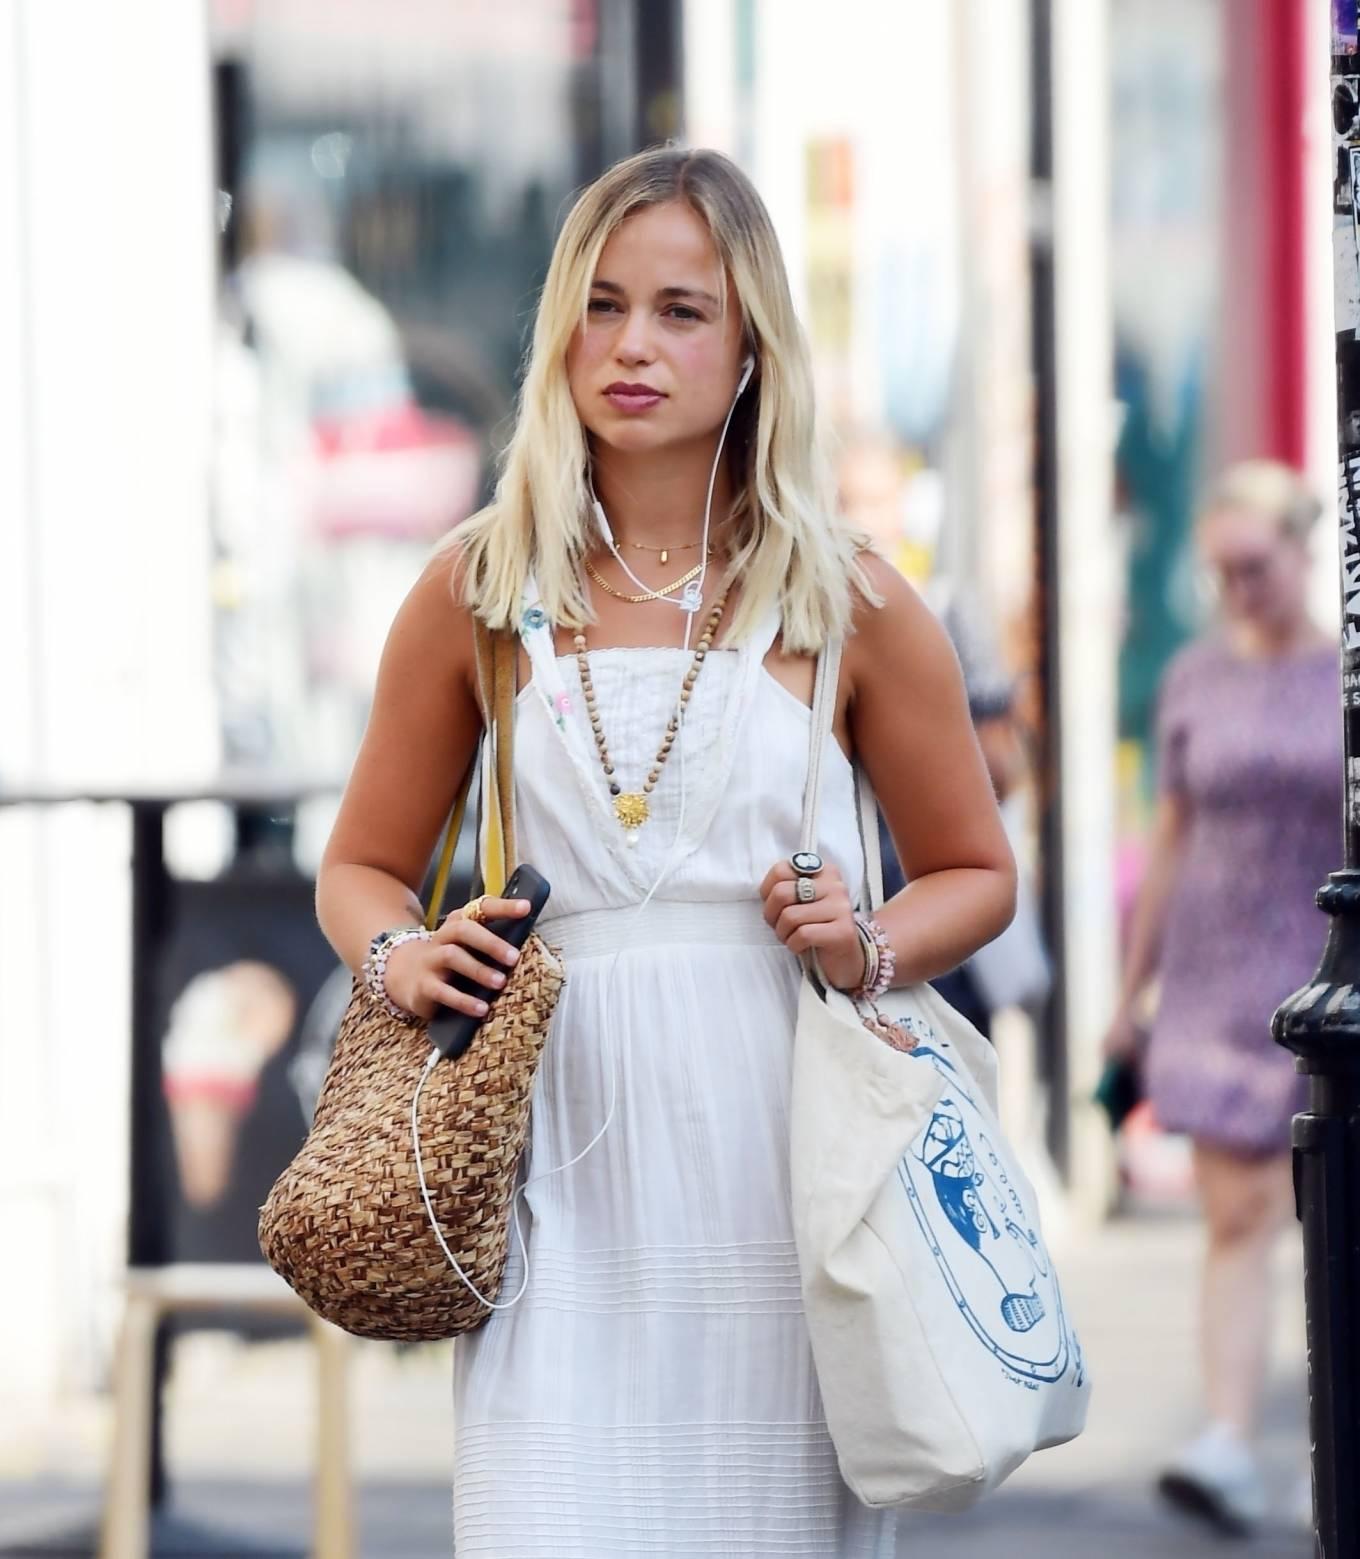 Amelia Windsor - Looks stunning in a white summery dress in London